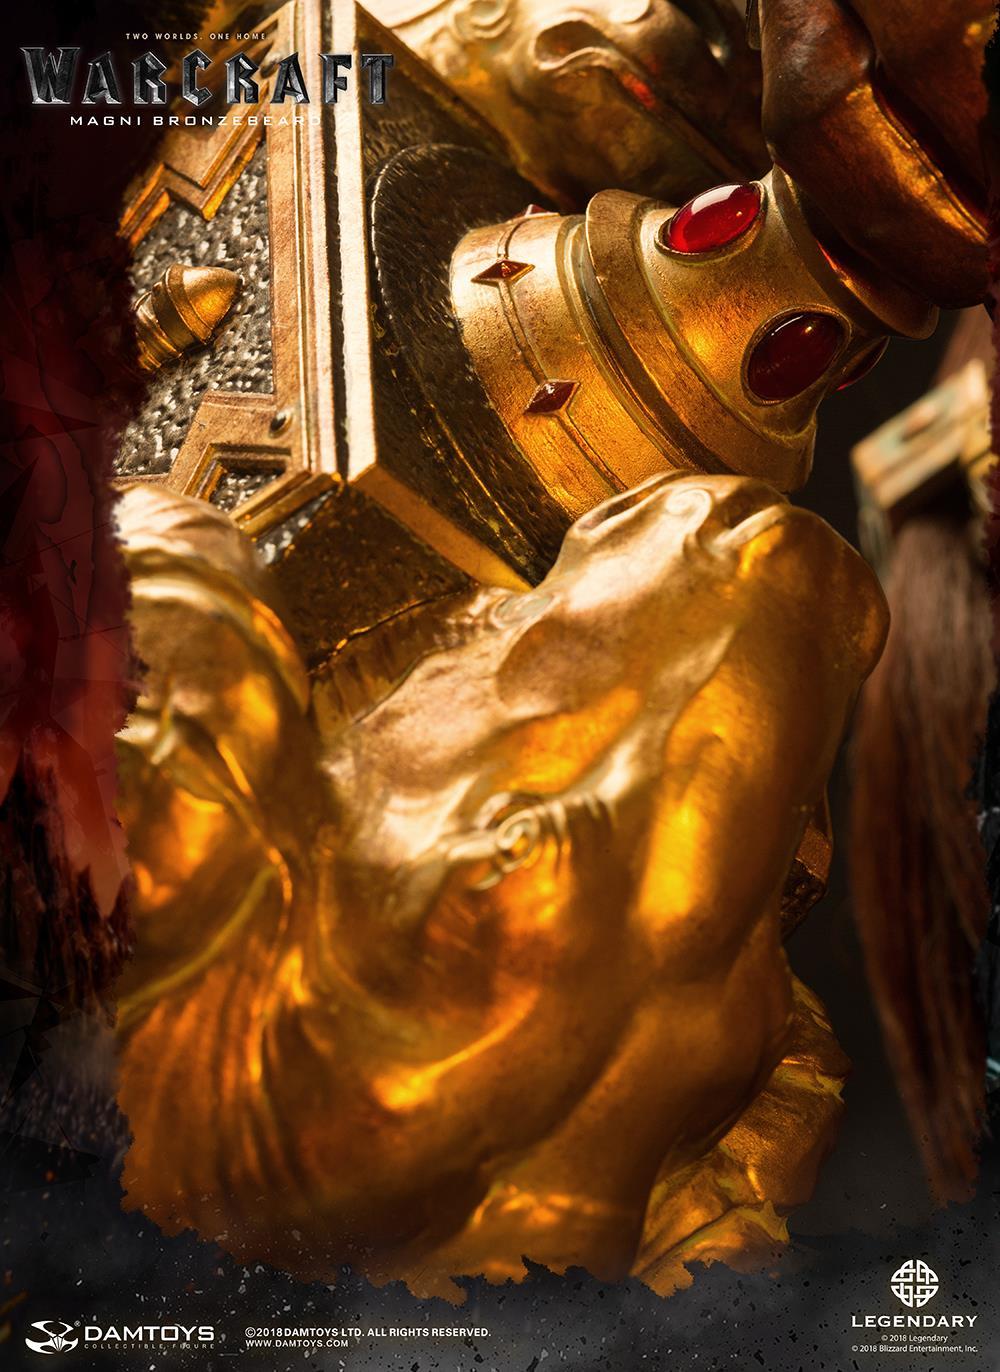 Link a DAMTOYS-Warcraft-Movie-Magni-Bronzebeard-014